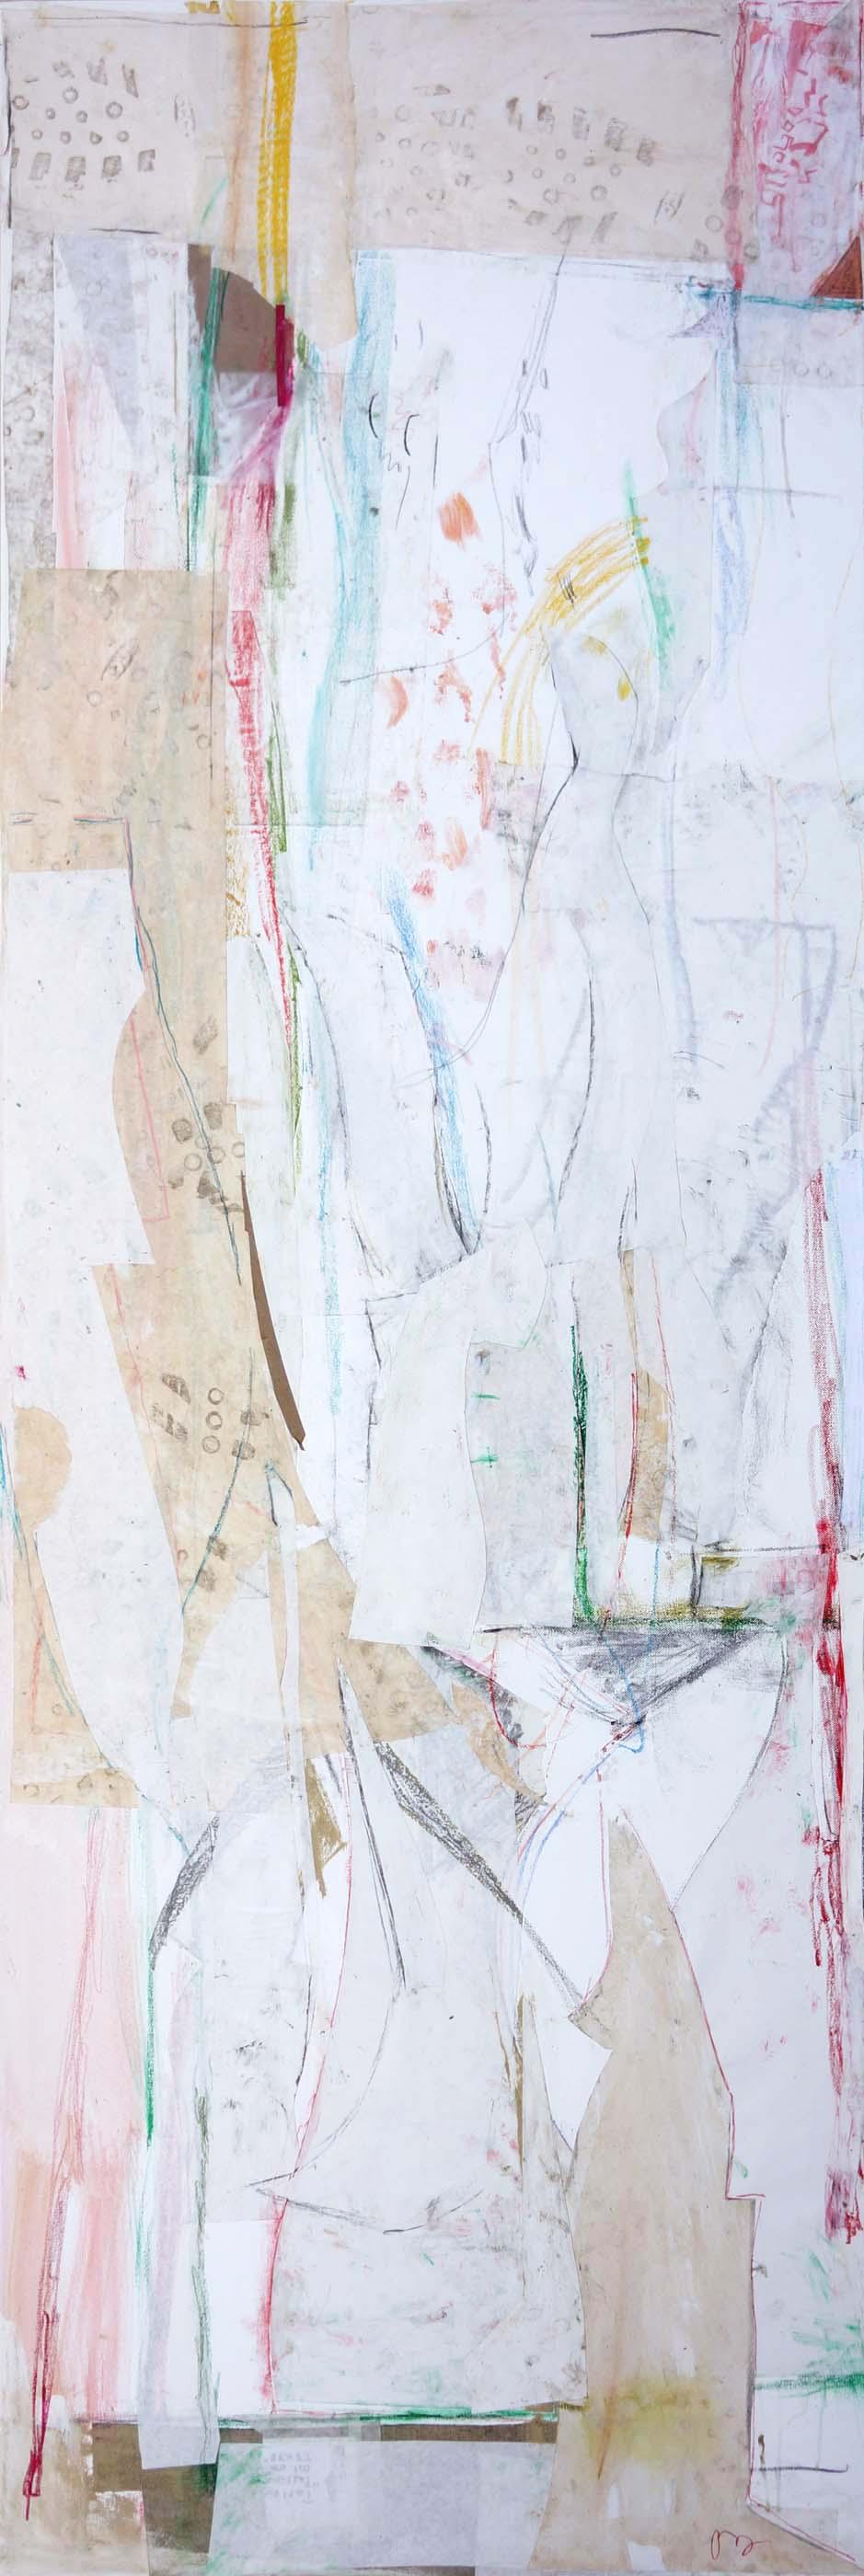 final painting, nov. 5, 2012